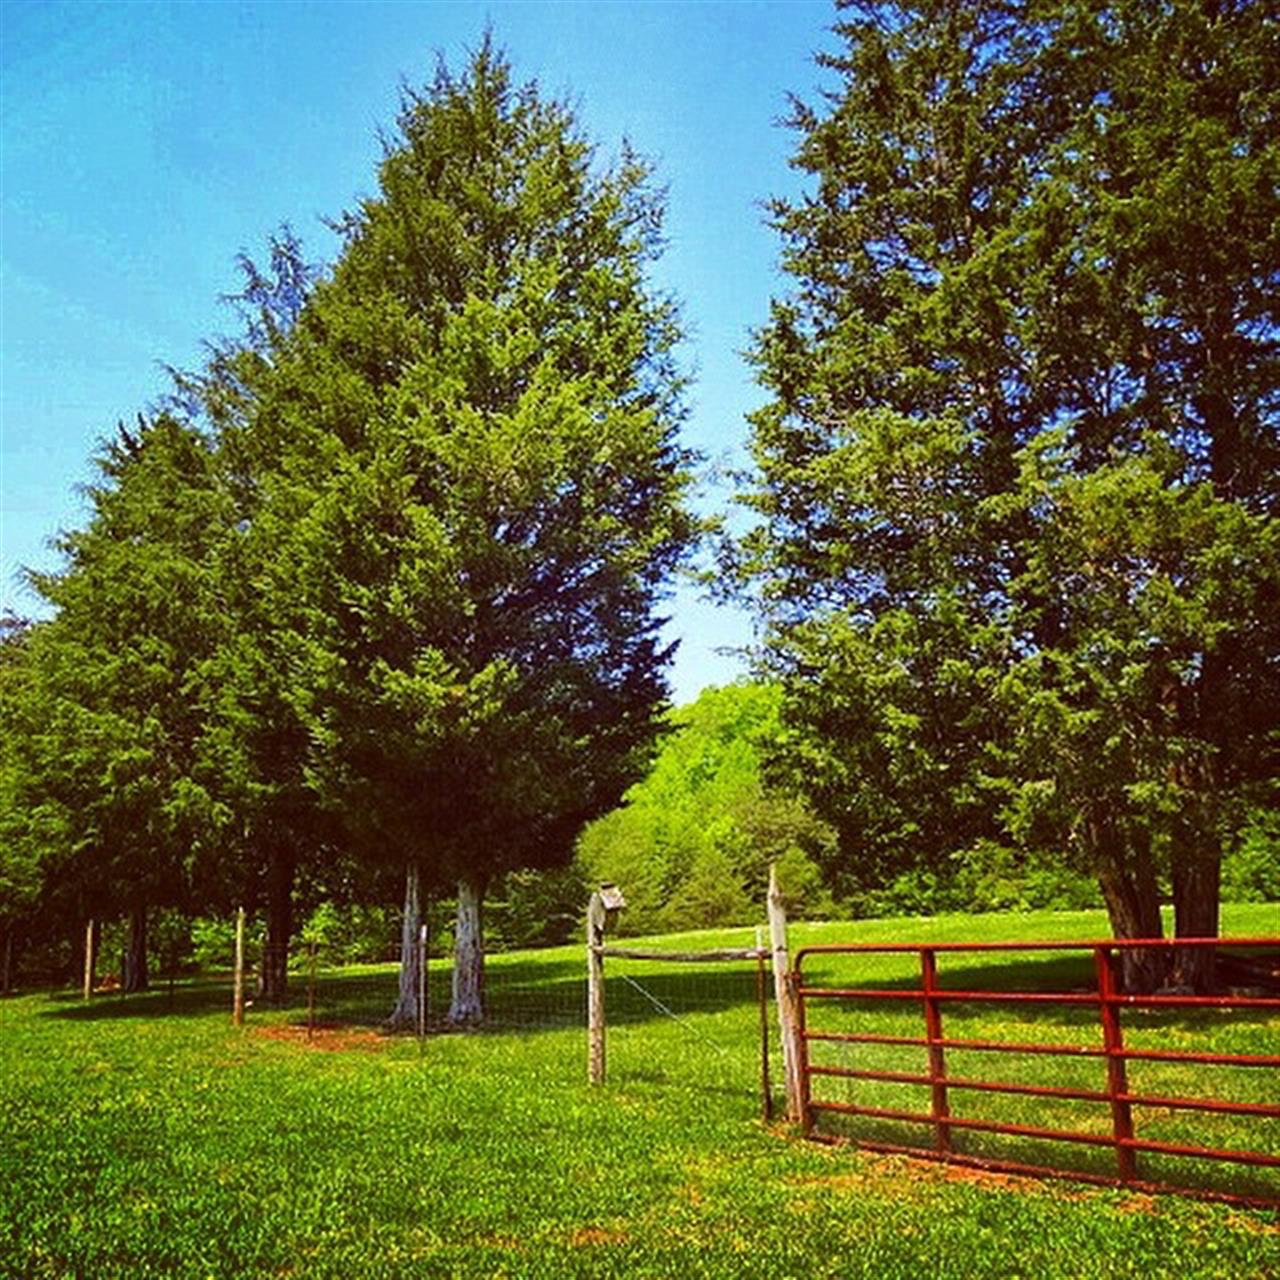 New listing! Lake Forest Drive Pfafftown. 17+ rolling acres. Really beautiful! $324,900 #minifarm #LeadingRElocal